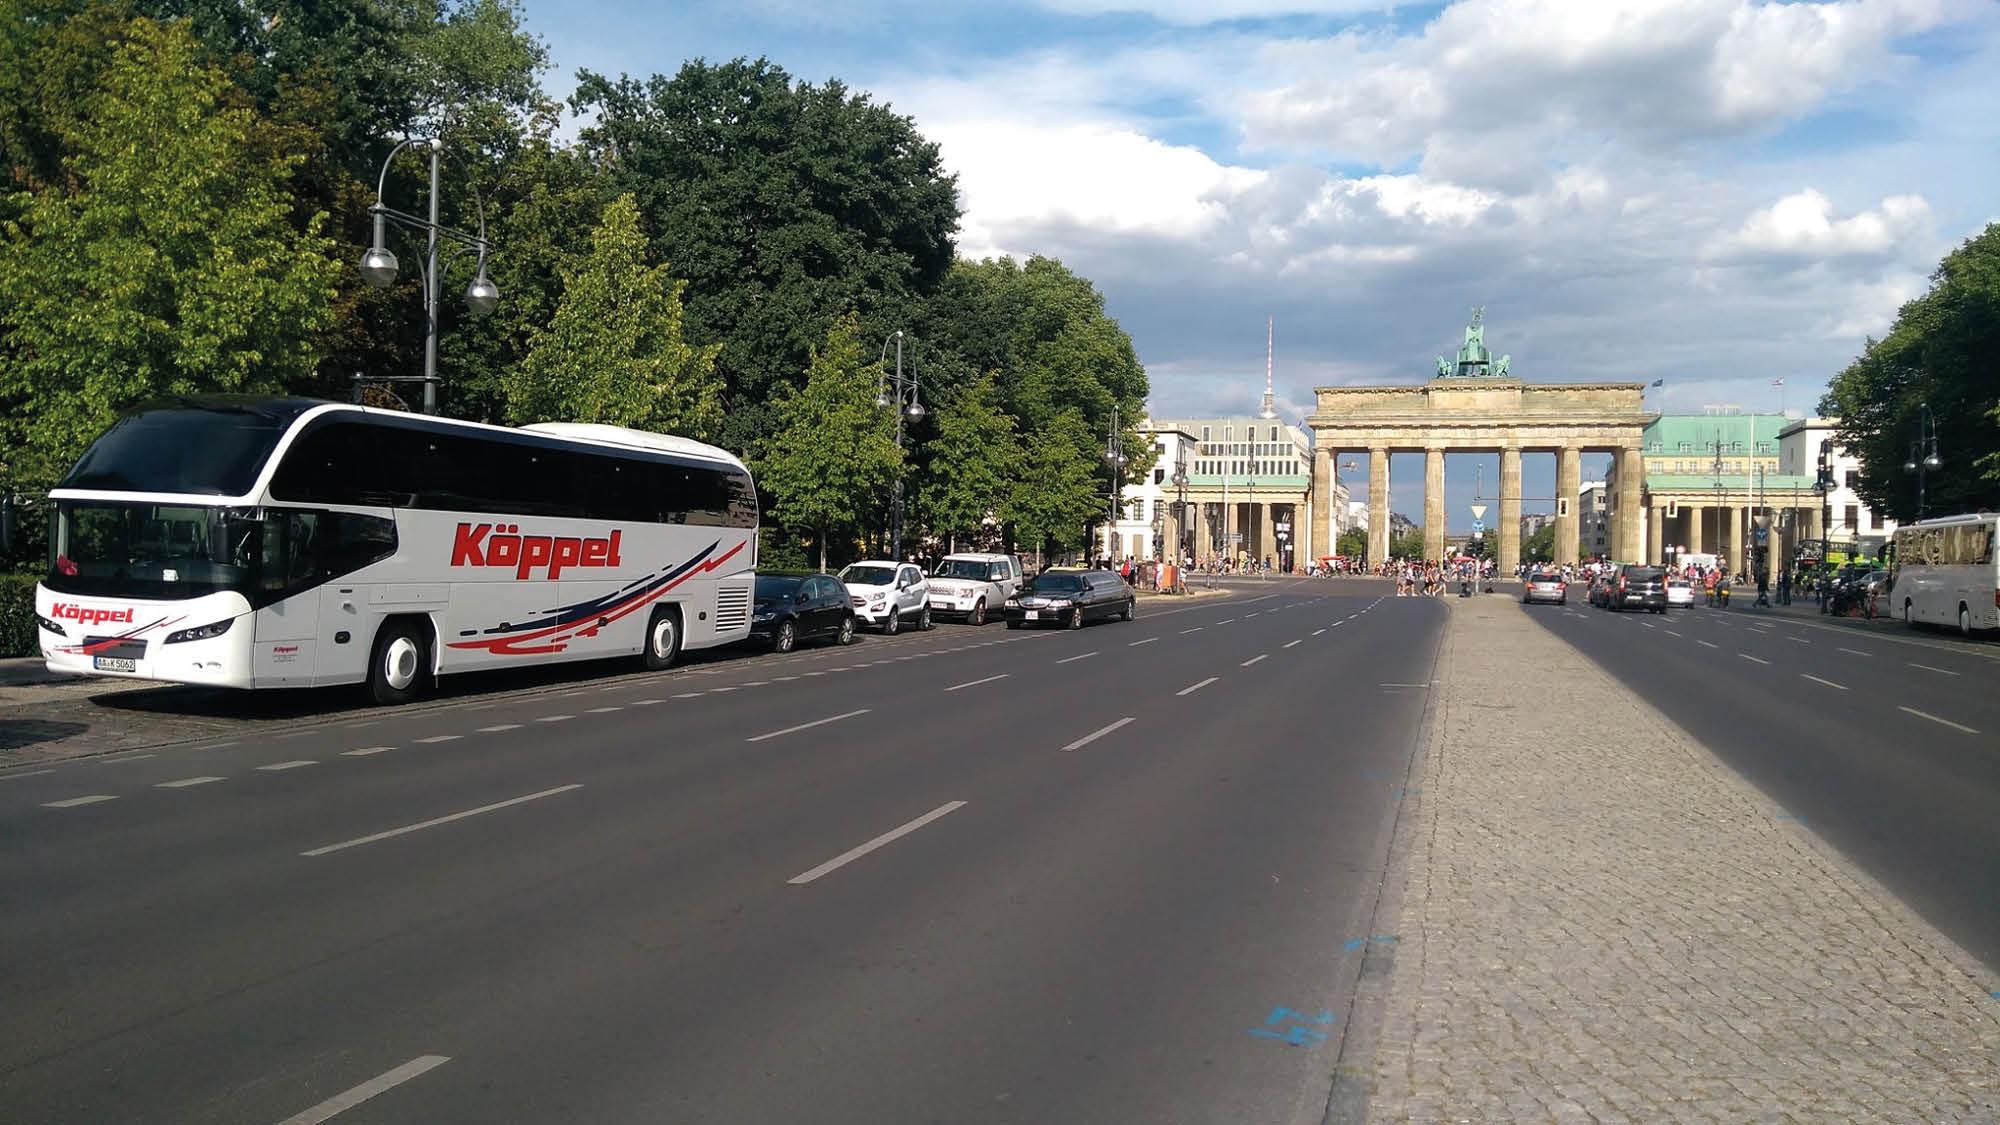 Köppel - Ellwangen - Website - Bus - 2019-12 - 04